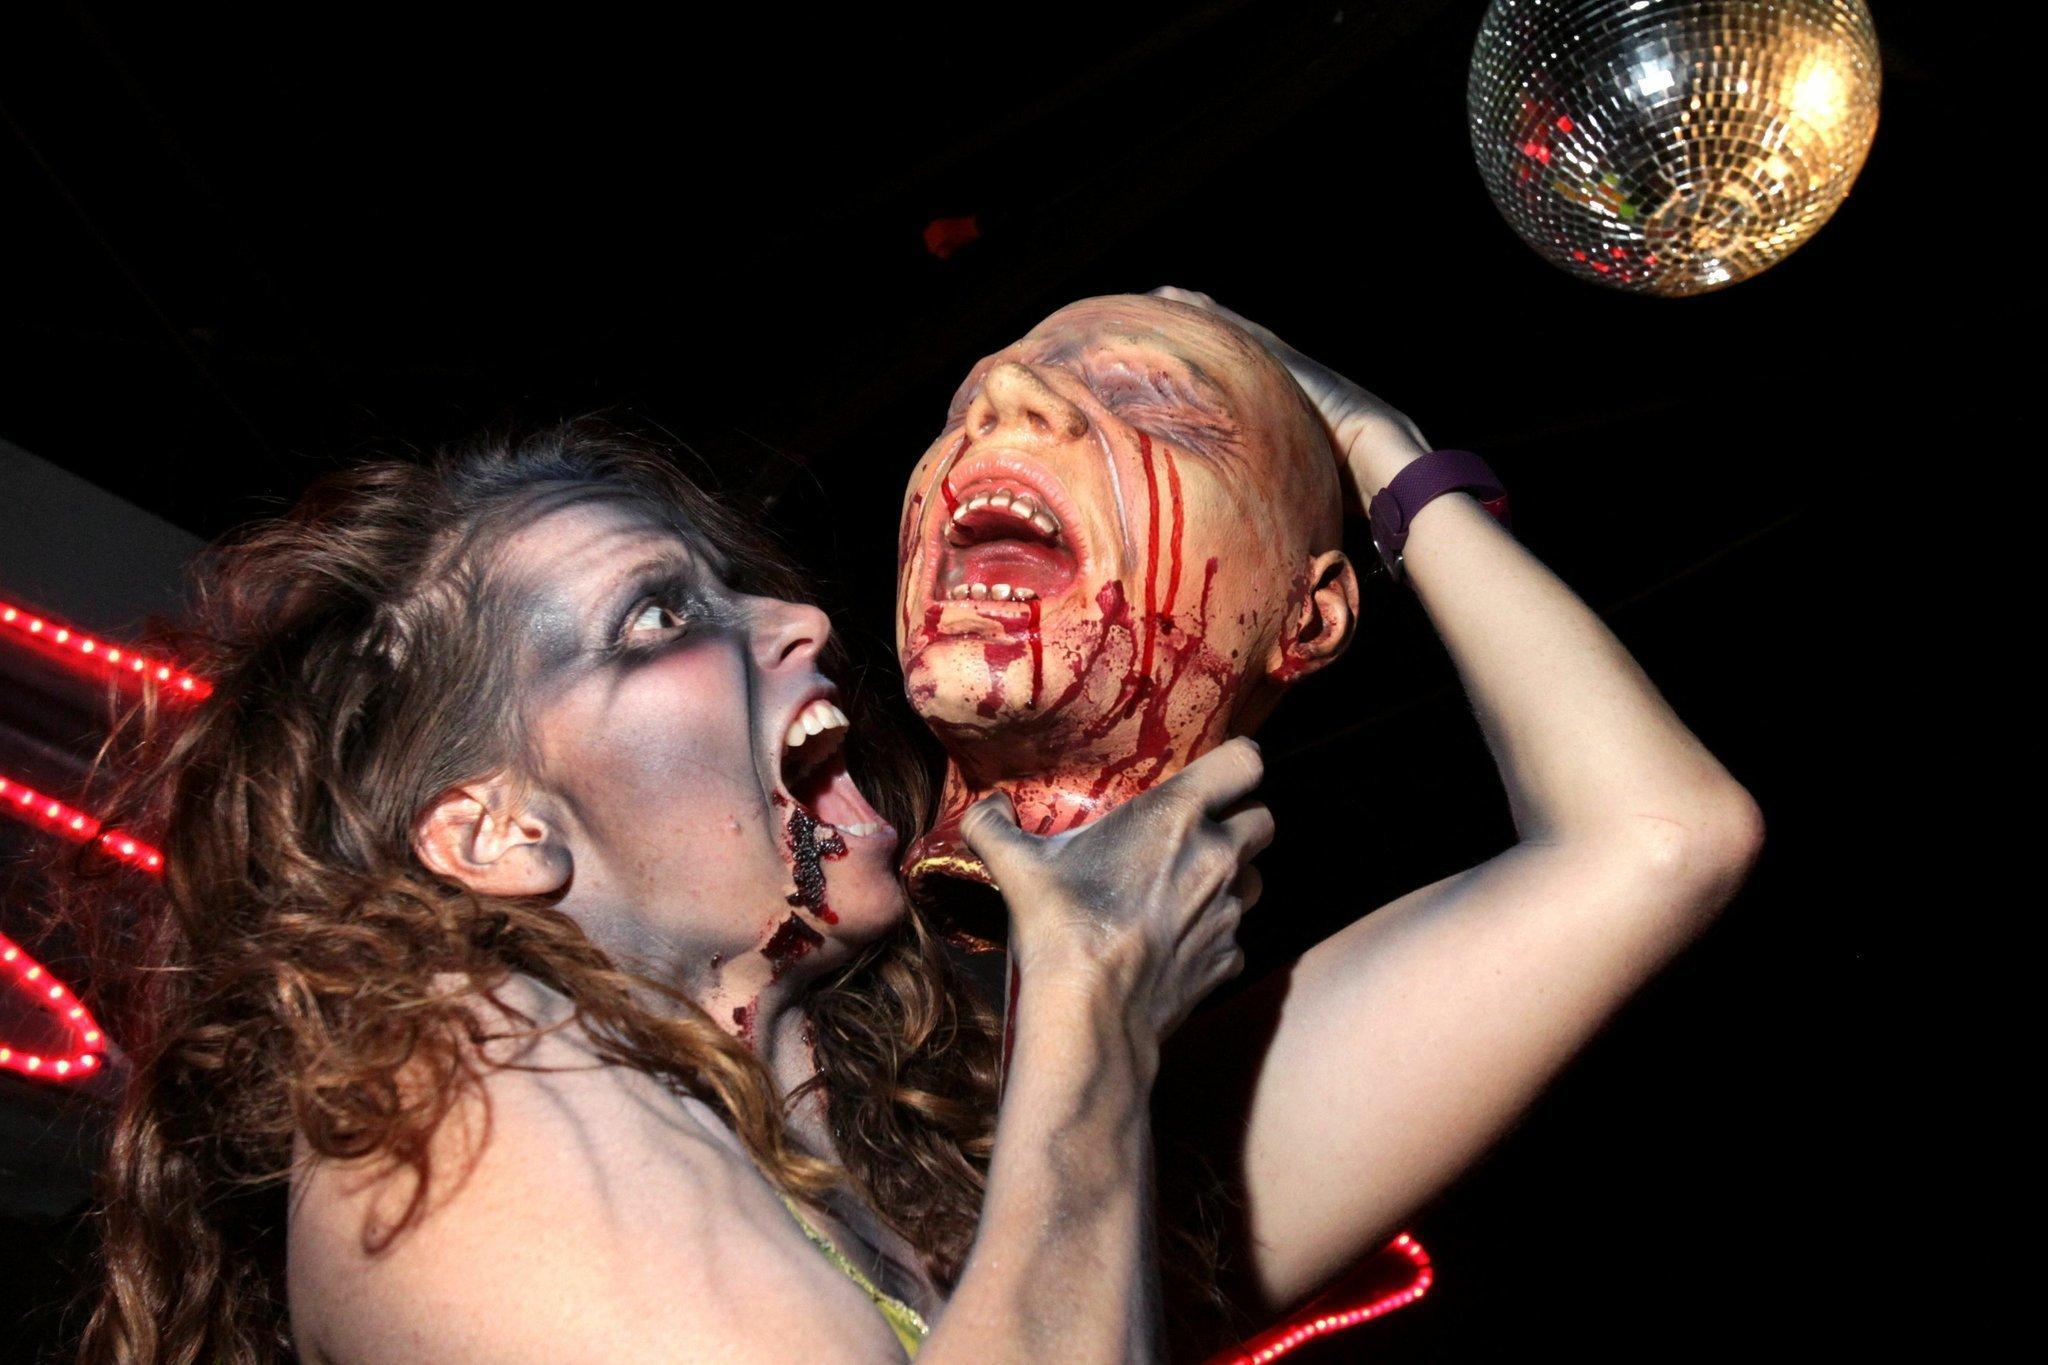 Halloween San Diego to get the inside scoop Top Halloween Parties Events In San Diego The San Diego Union Tribune